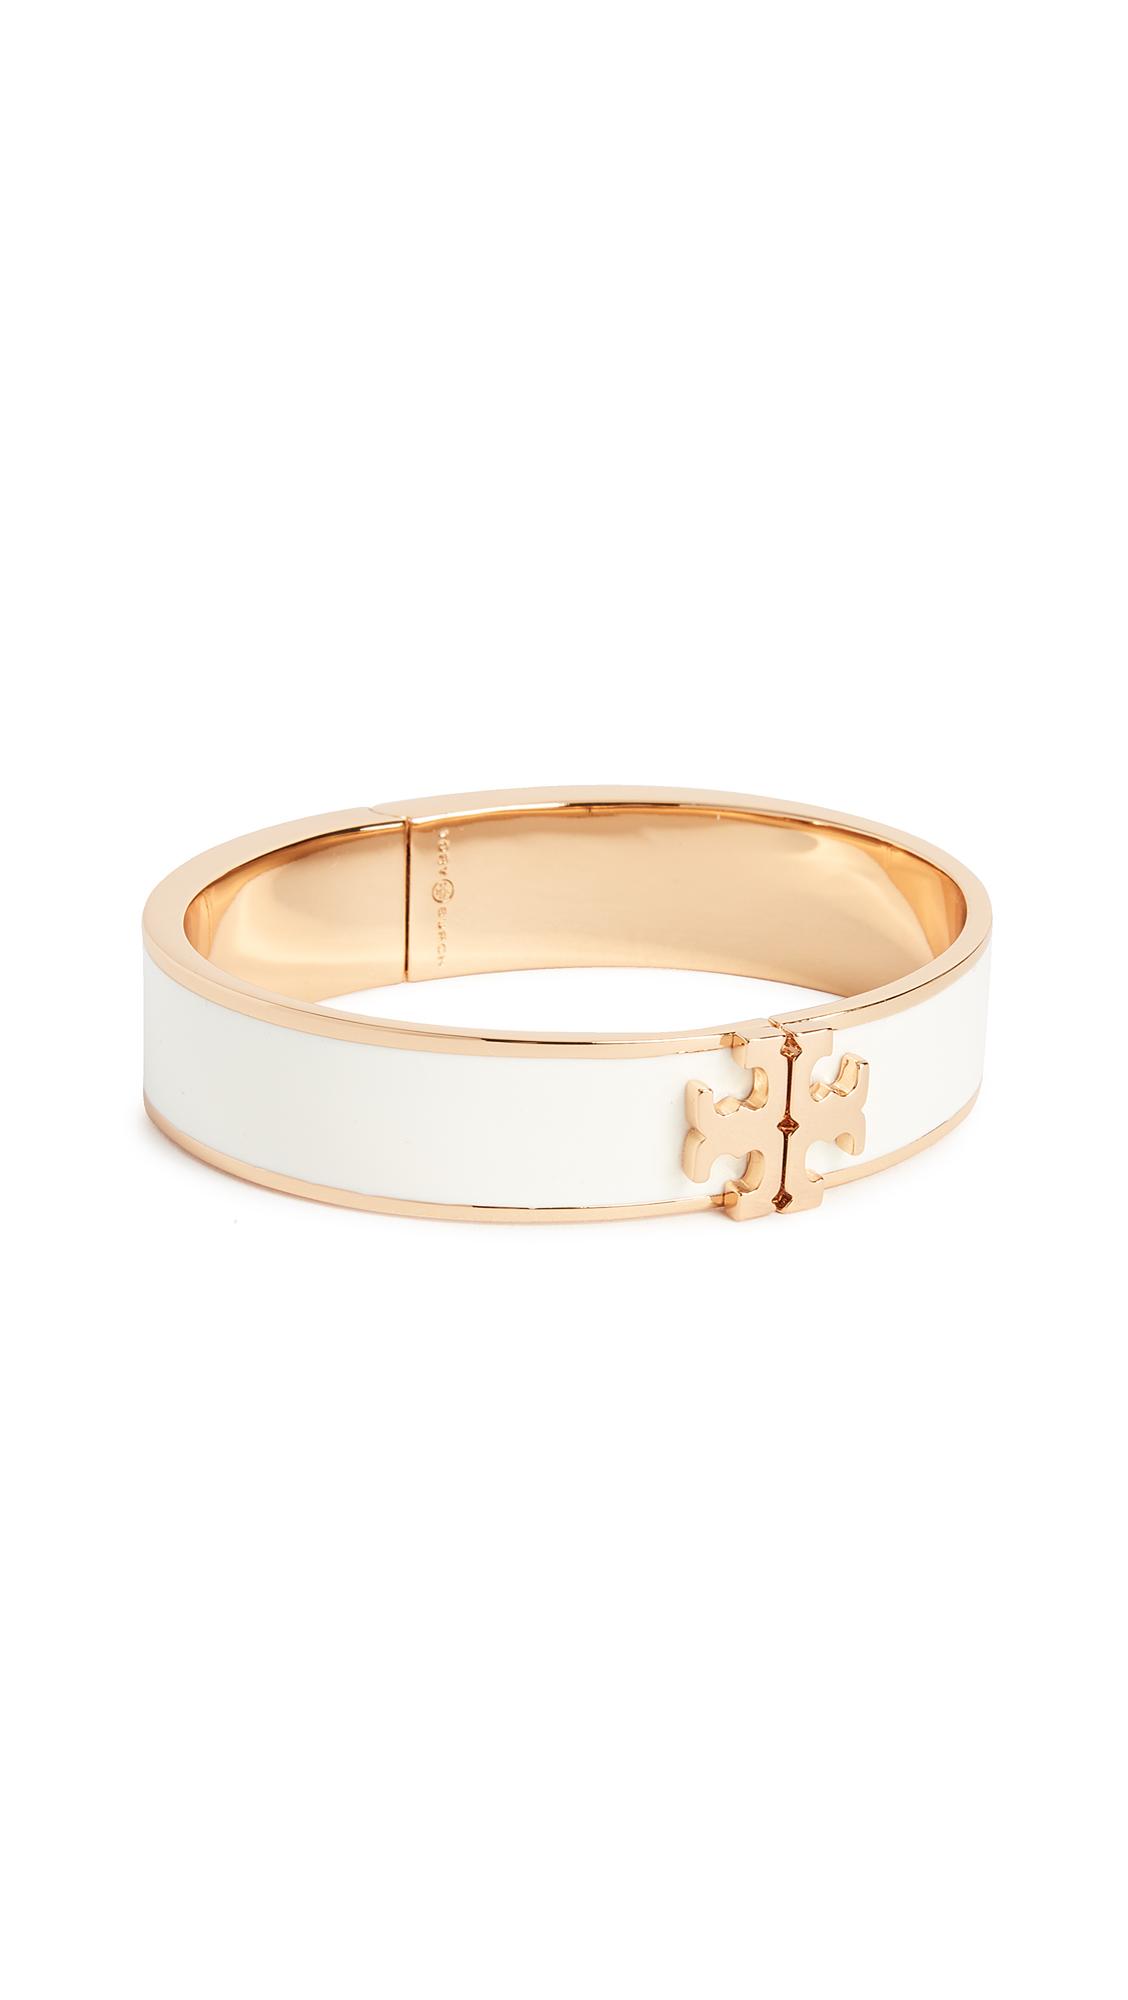 Tory Burch Logo Thin Enamel Hinged Bracelet - Ivory/Gold